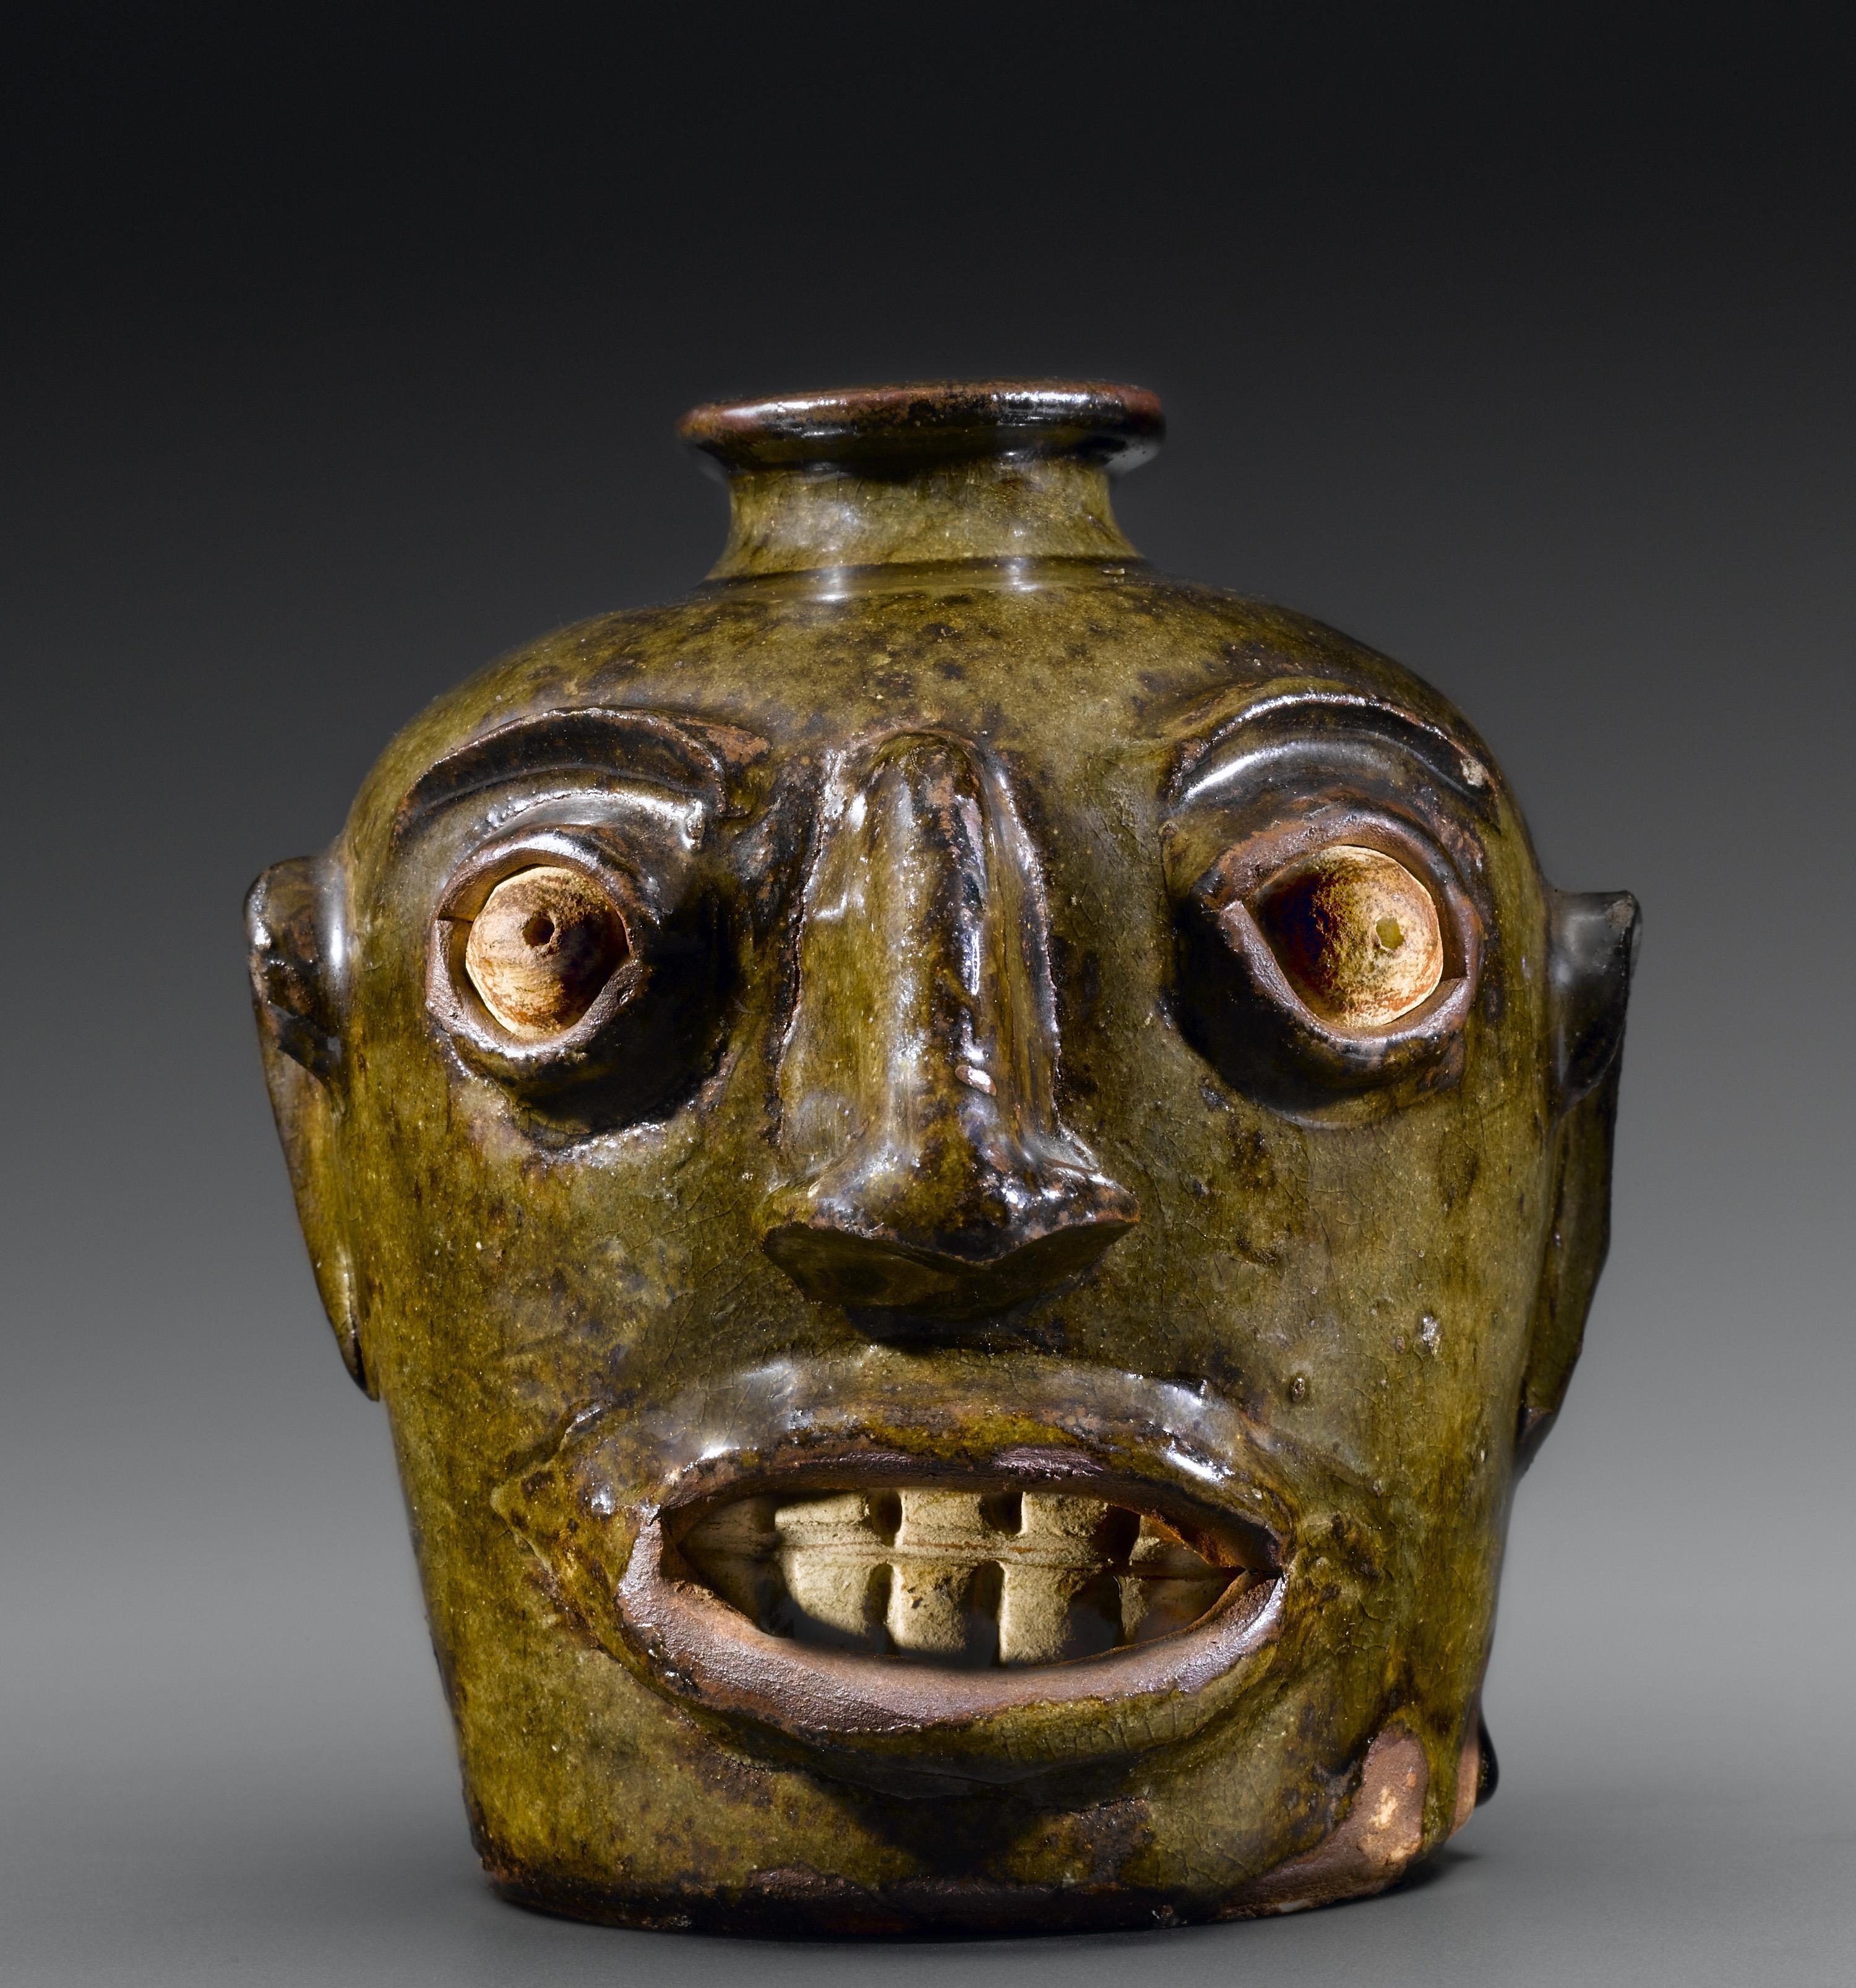 Face Jug, 1860-80. Chipstone Foundation Collection. Photo by Gavin Ashworth.